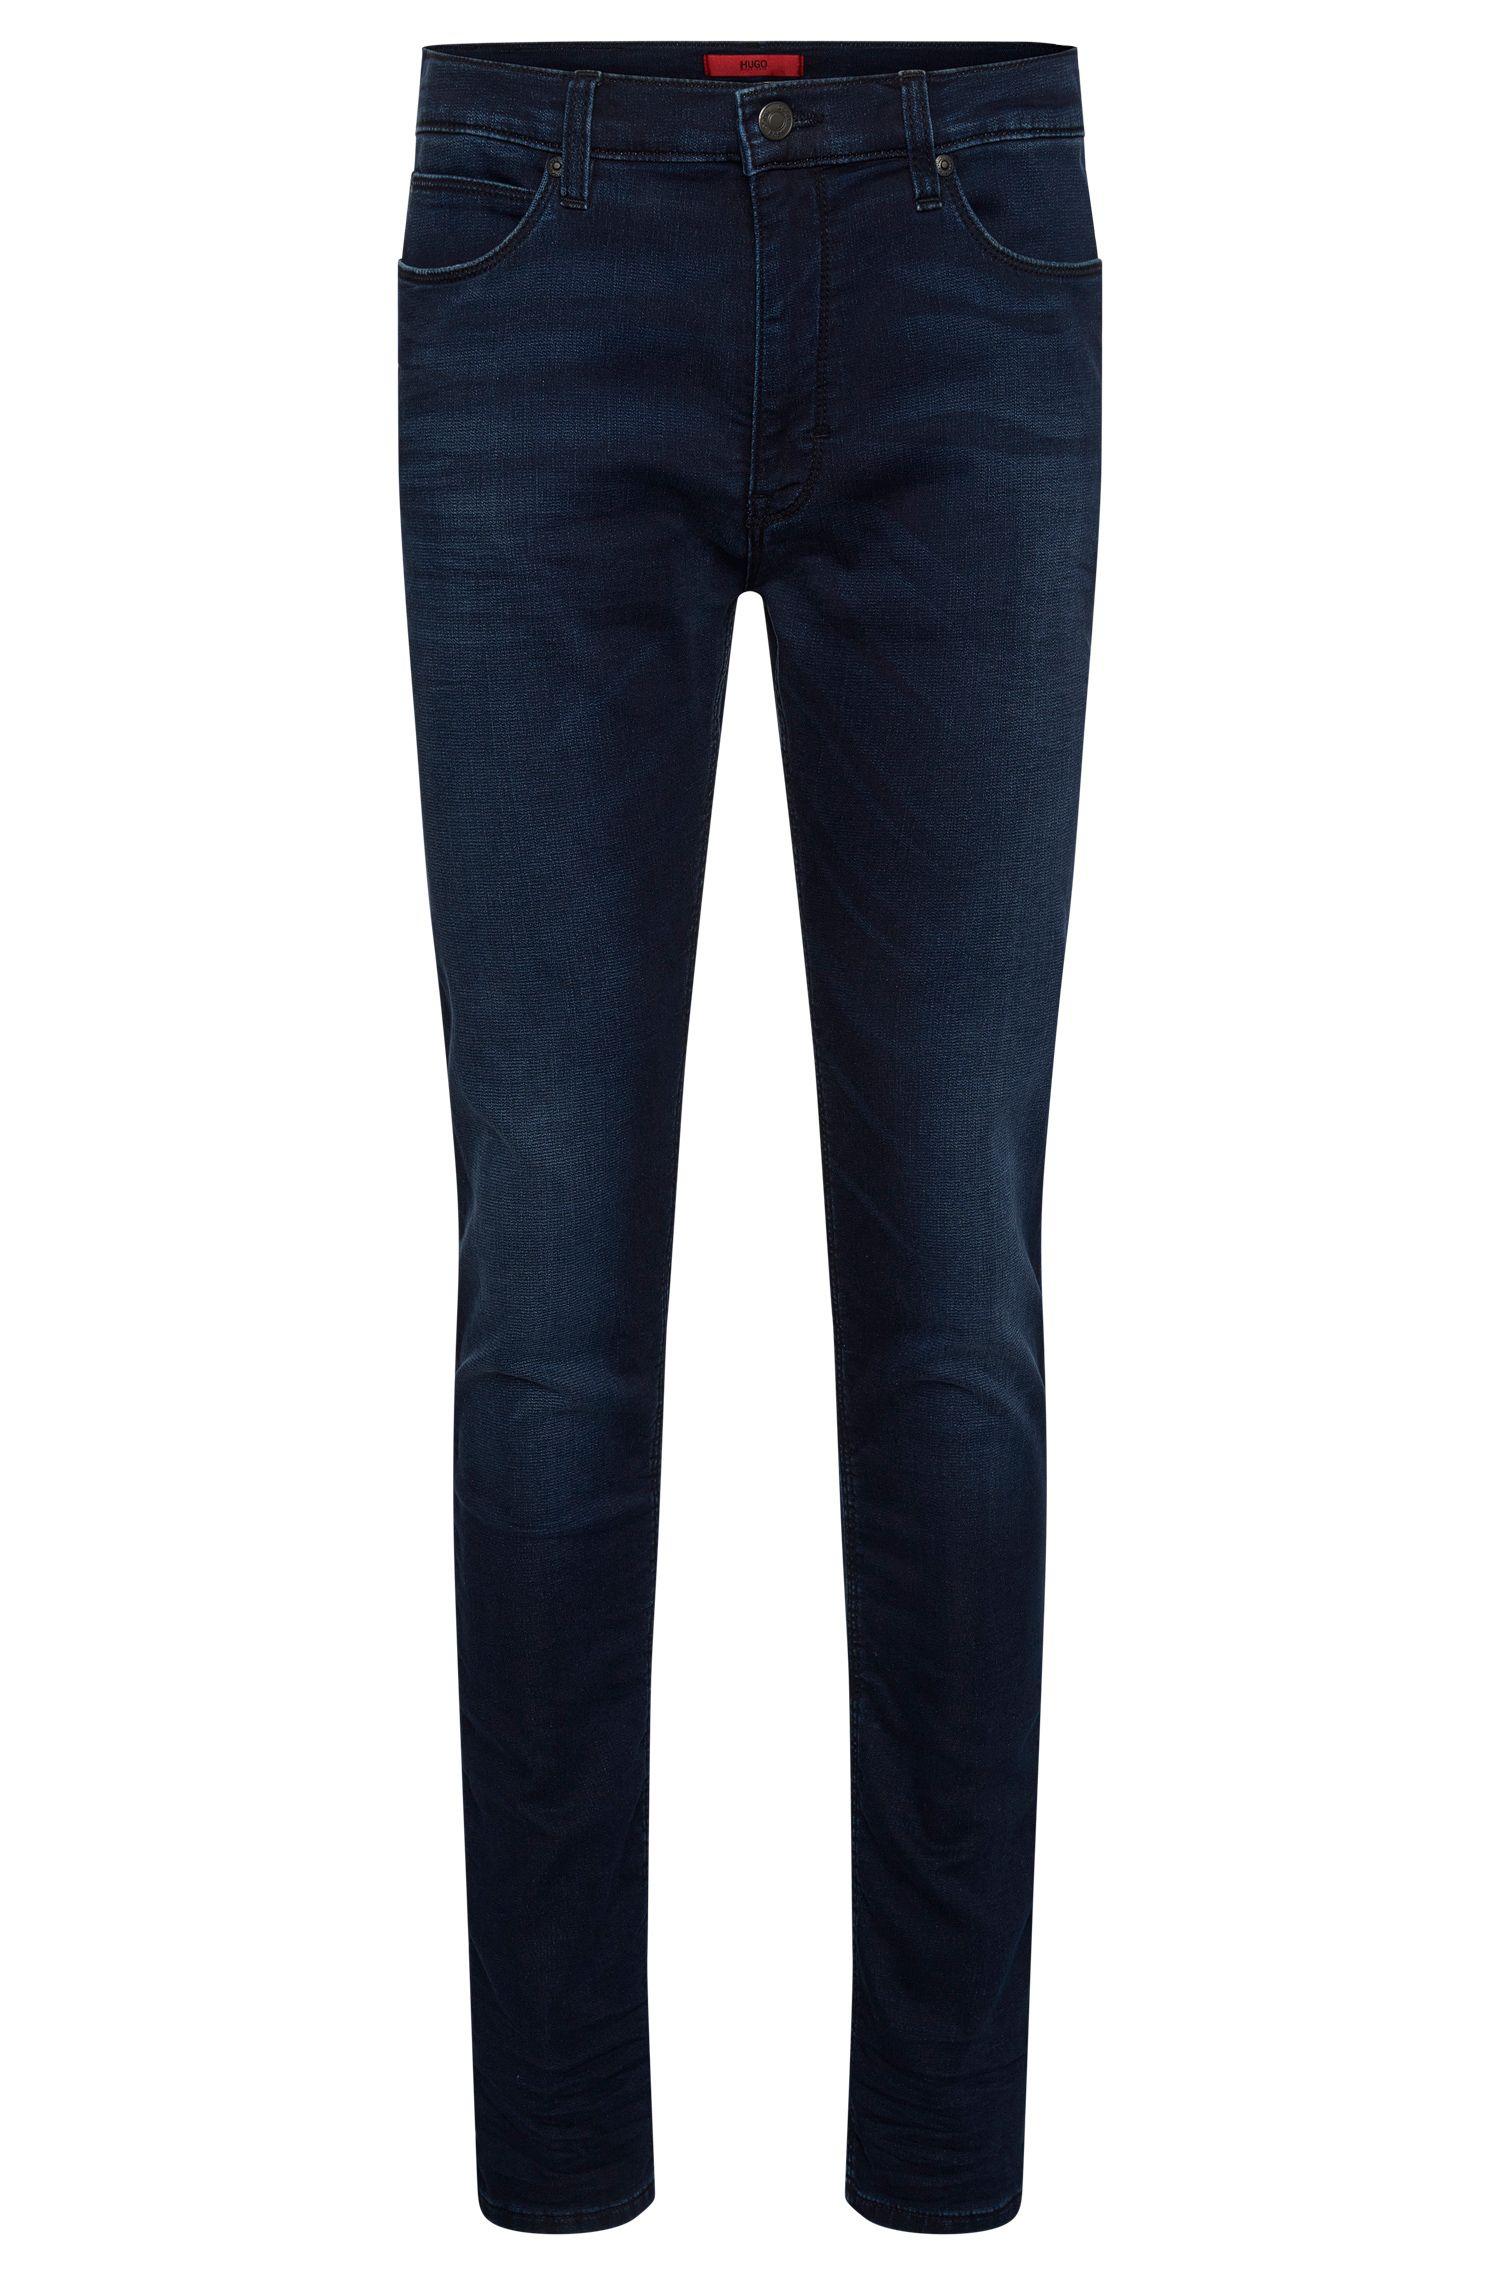 'HUGO 734' | Skinny Fit, 8.5 oz Stretch Cotton Jeans